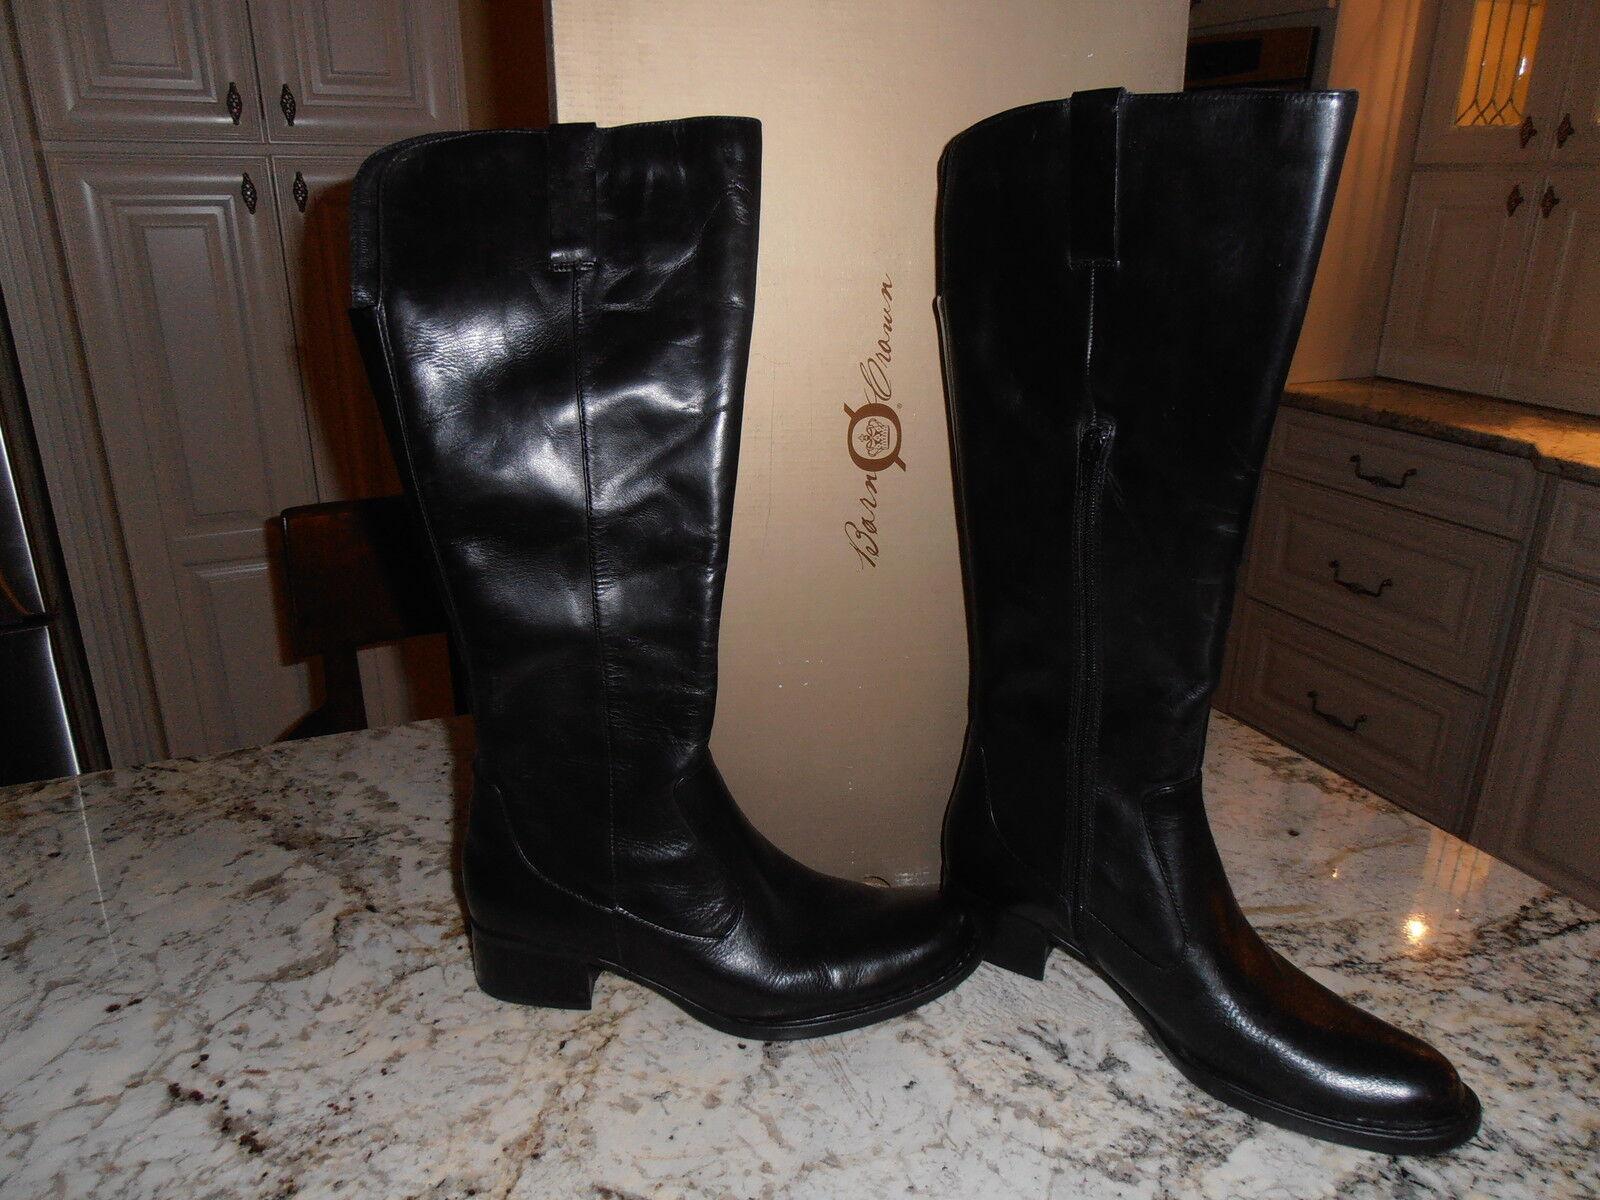 Gentleman/Lady WOMEN'S BORN CHEYENNE BLACK BOOTS 9.5M product economic Brand high quality product 9.5M 29e640